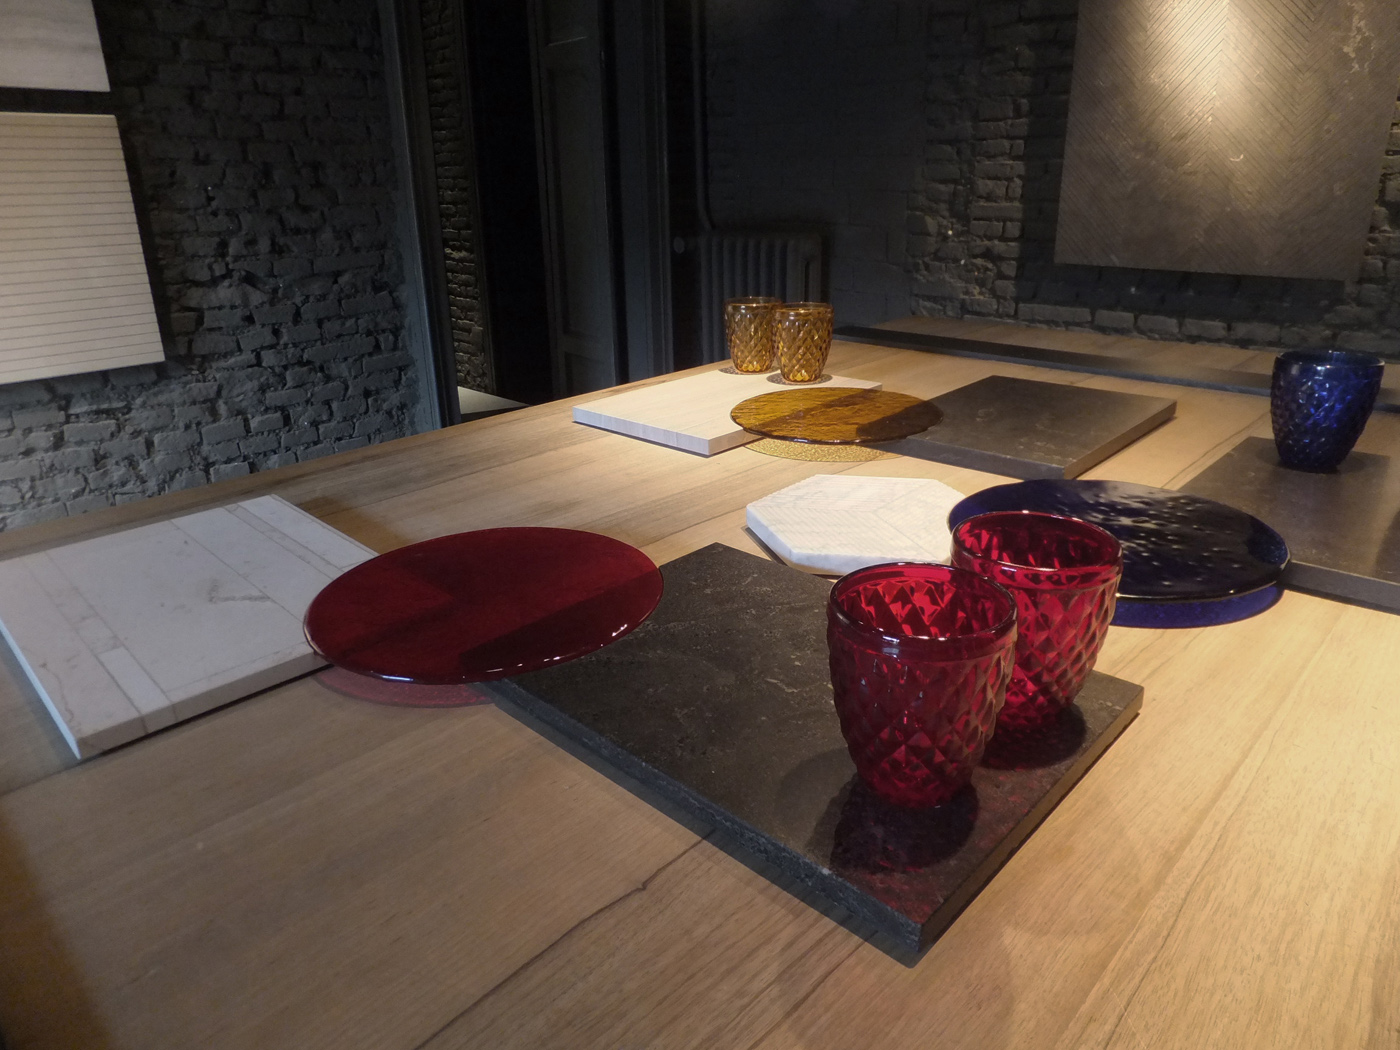 09_Salvatori_marmo_Plat-eau glass_Silvia Fanticelli